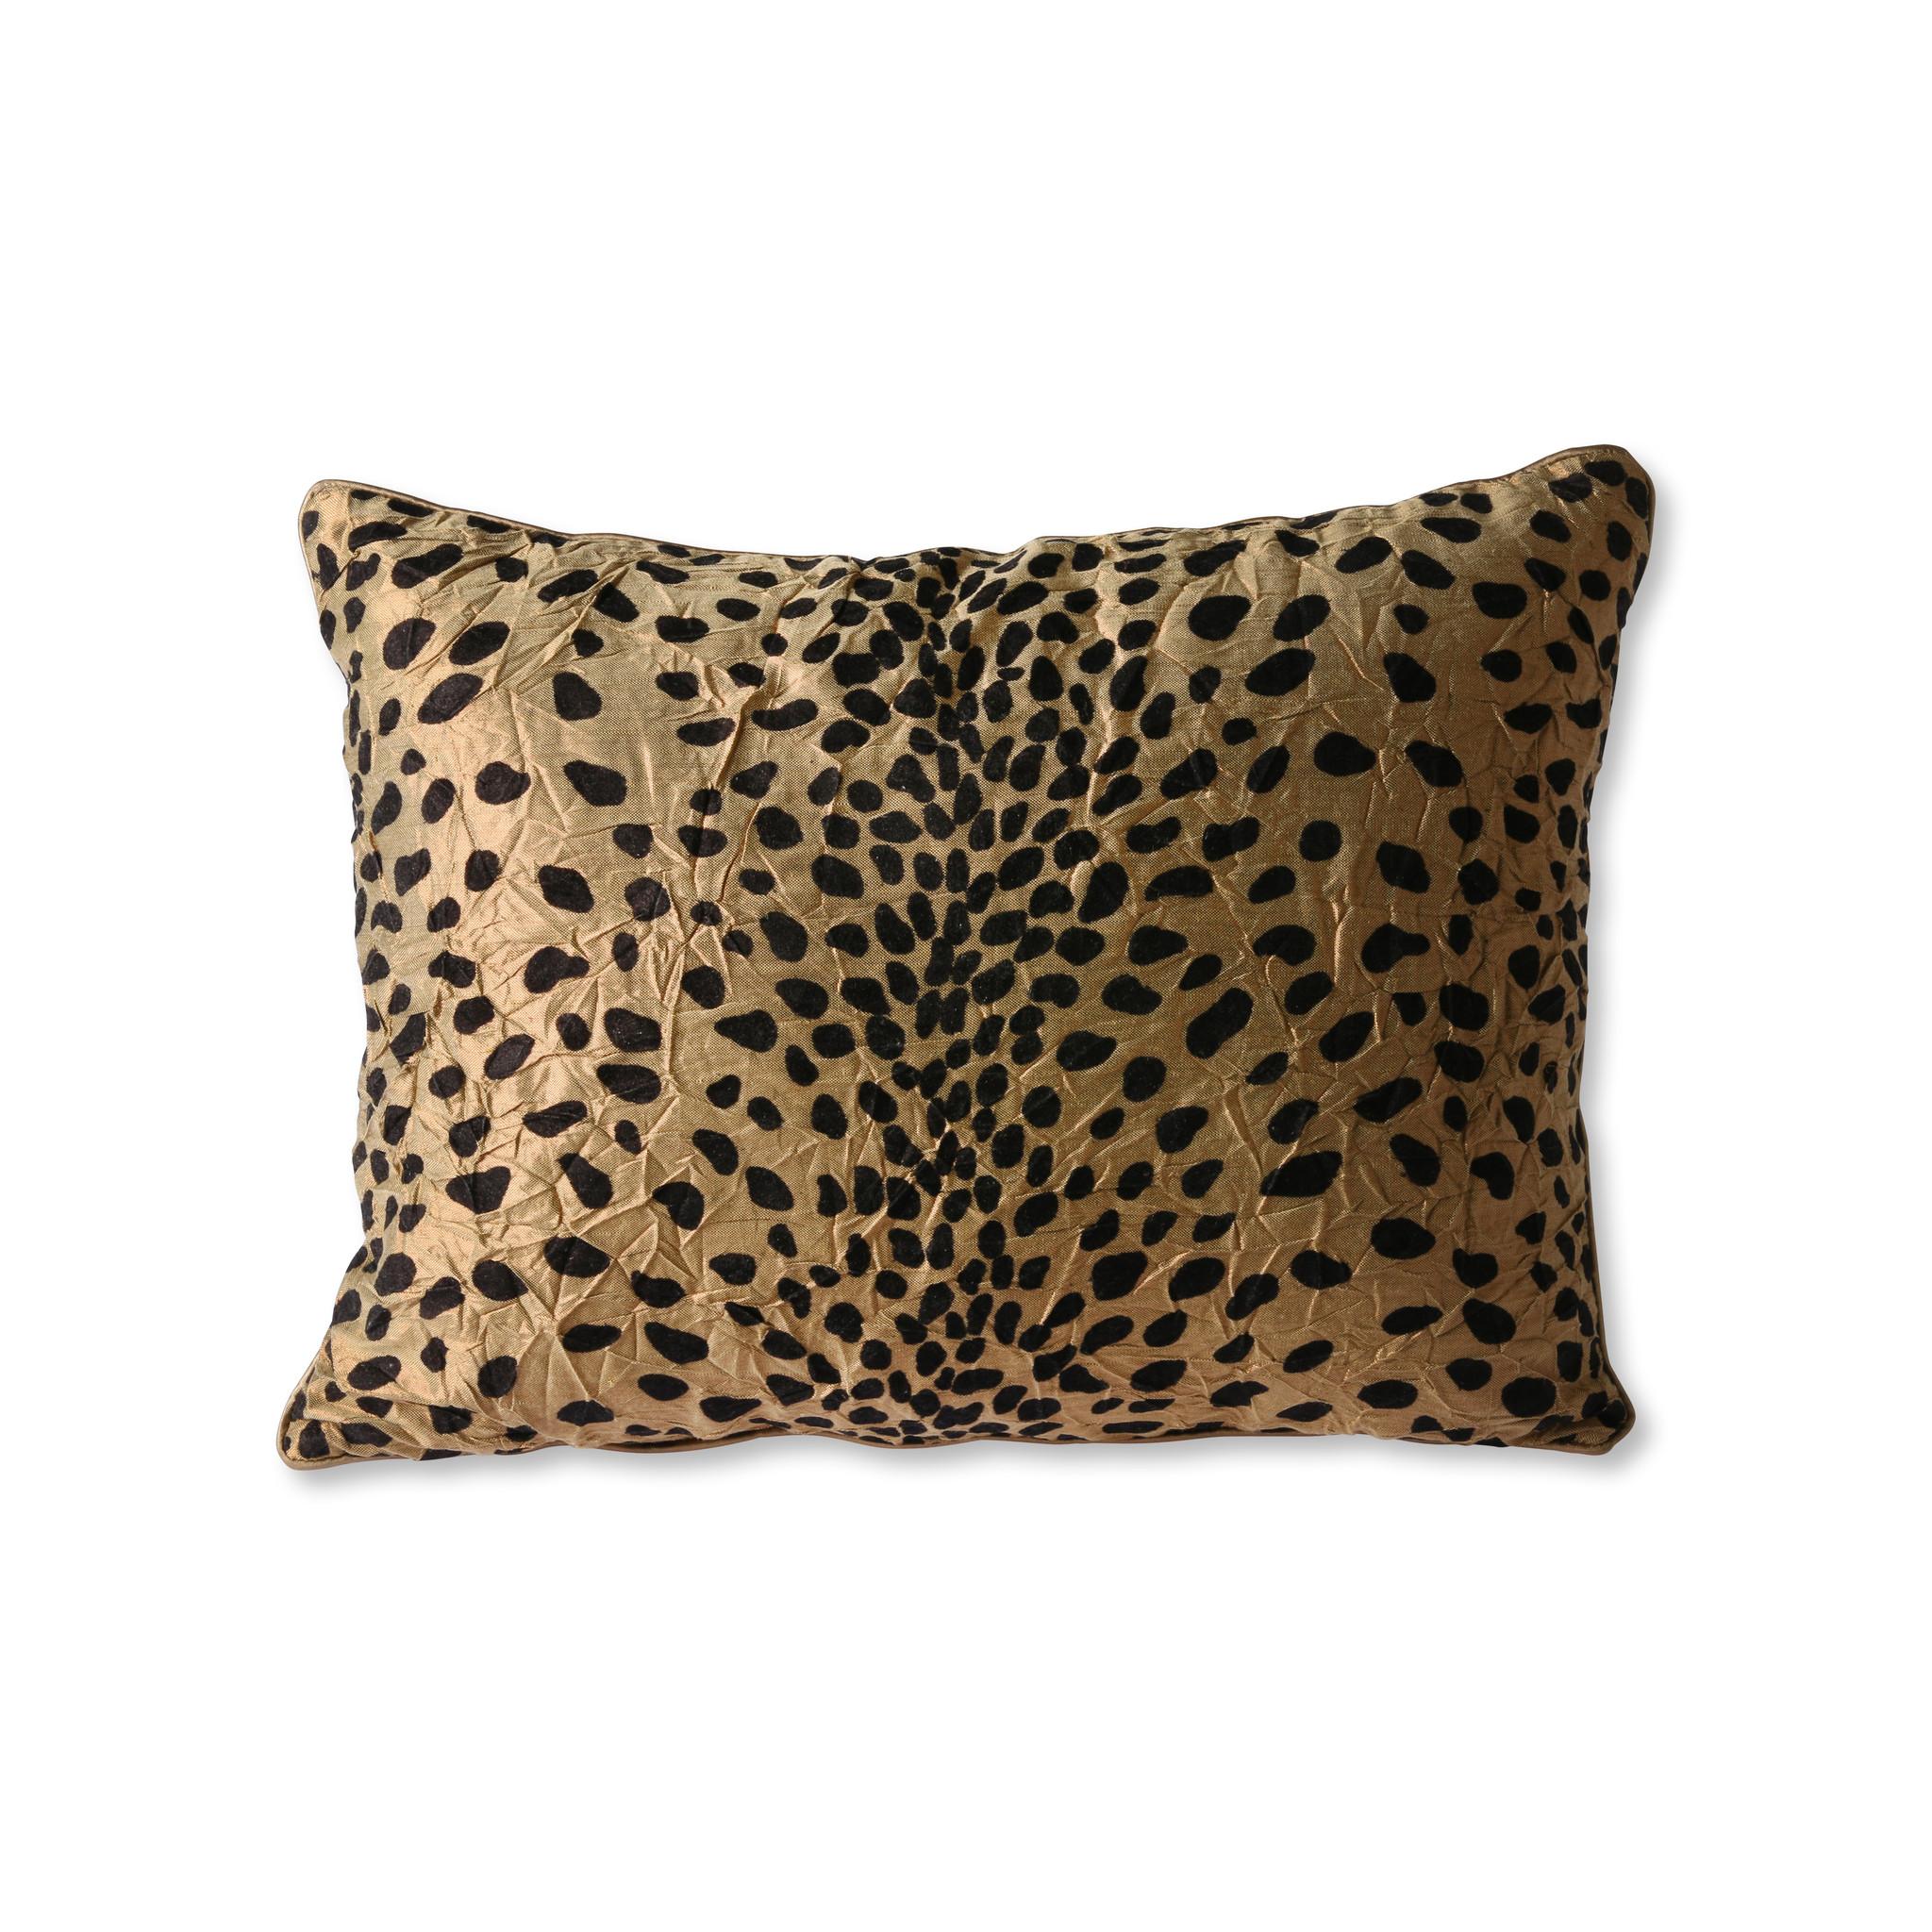 doris for hkliving cushion flock print panther